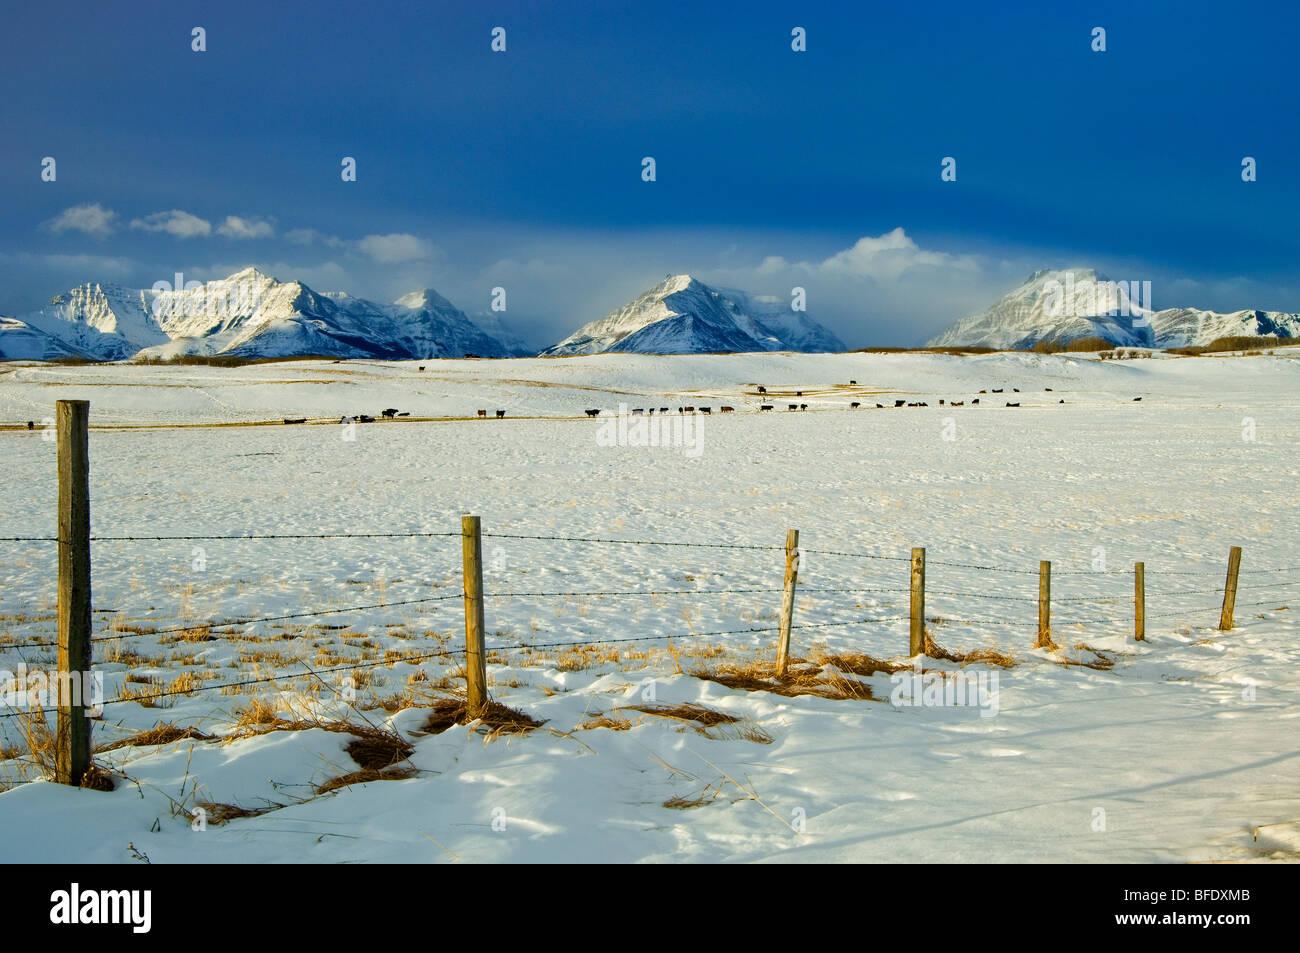 Snowy landscape where the prairies meet the mountains, near Twin Butte, Alberta, Canada - Stock Image